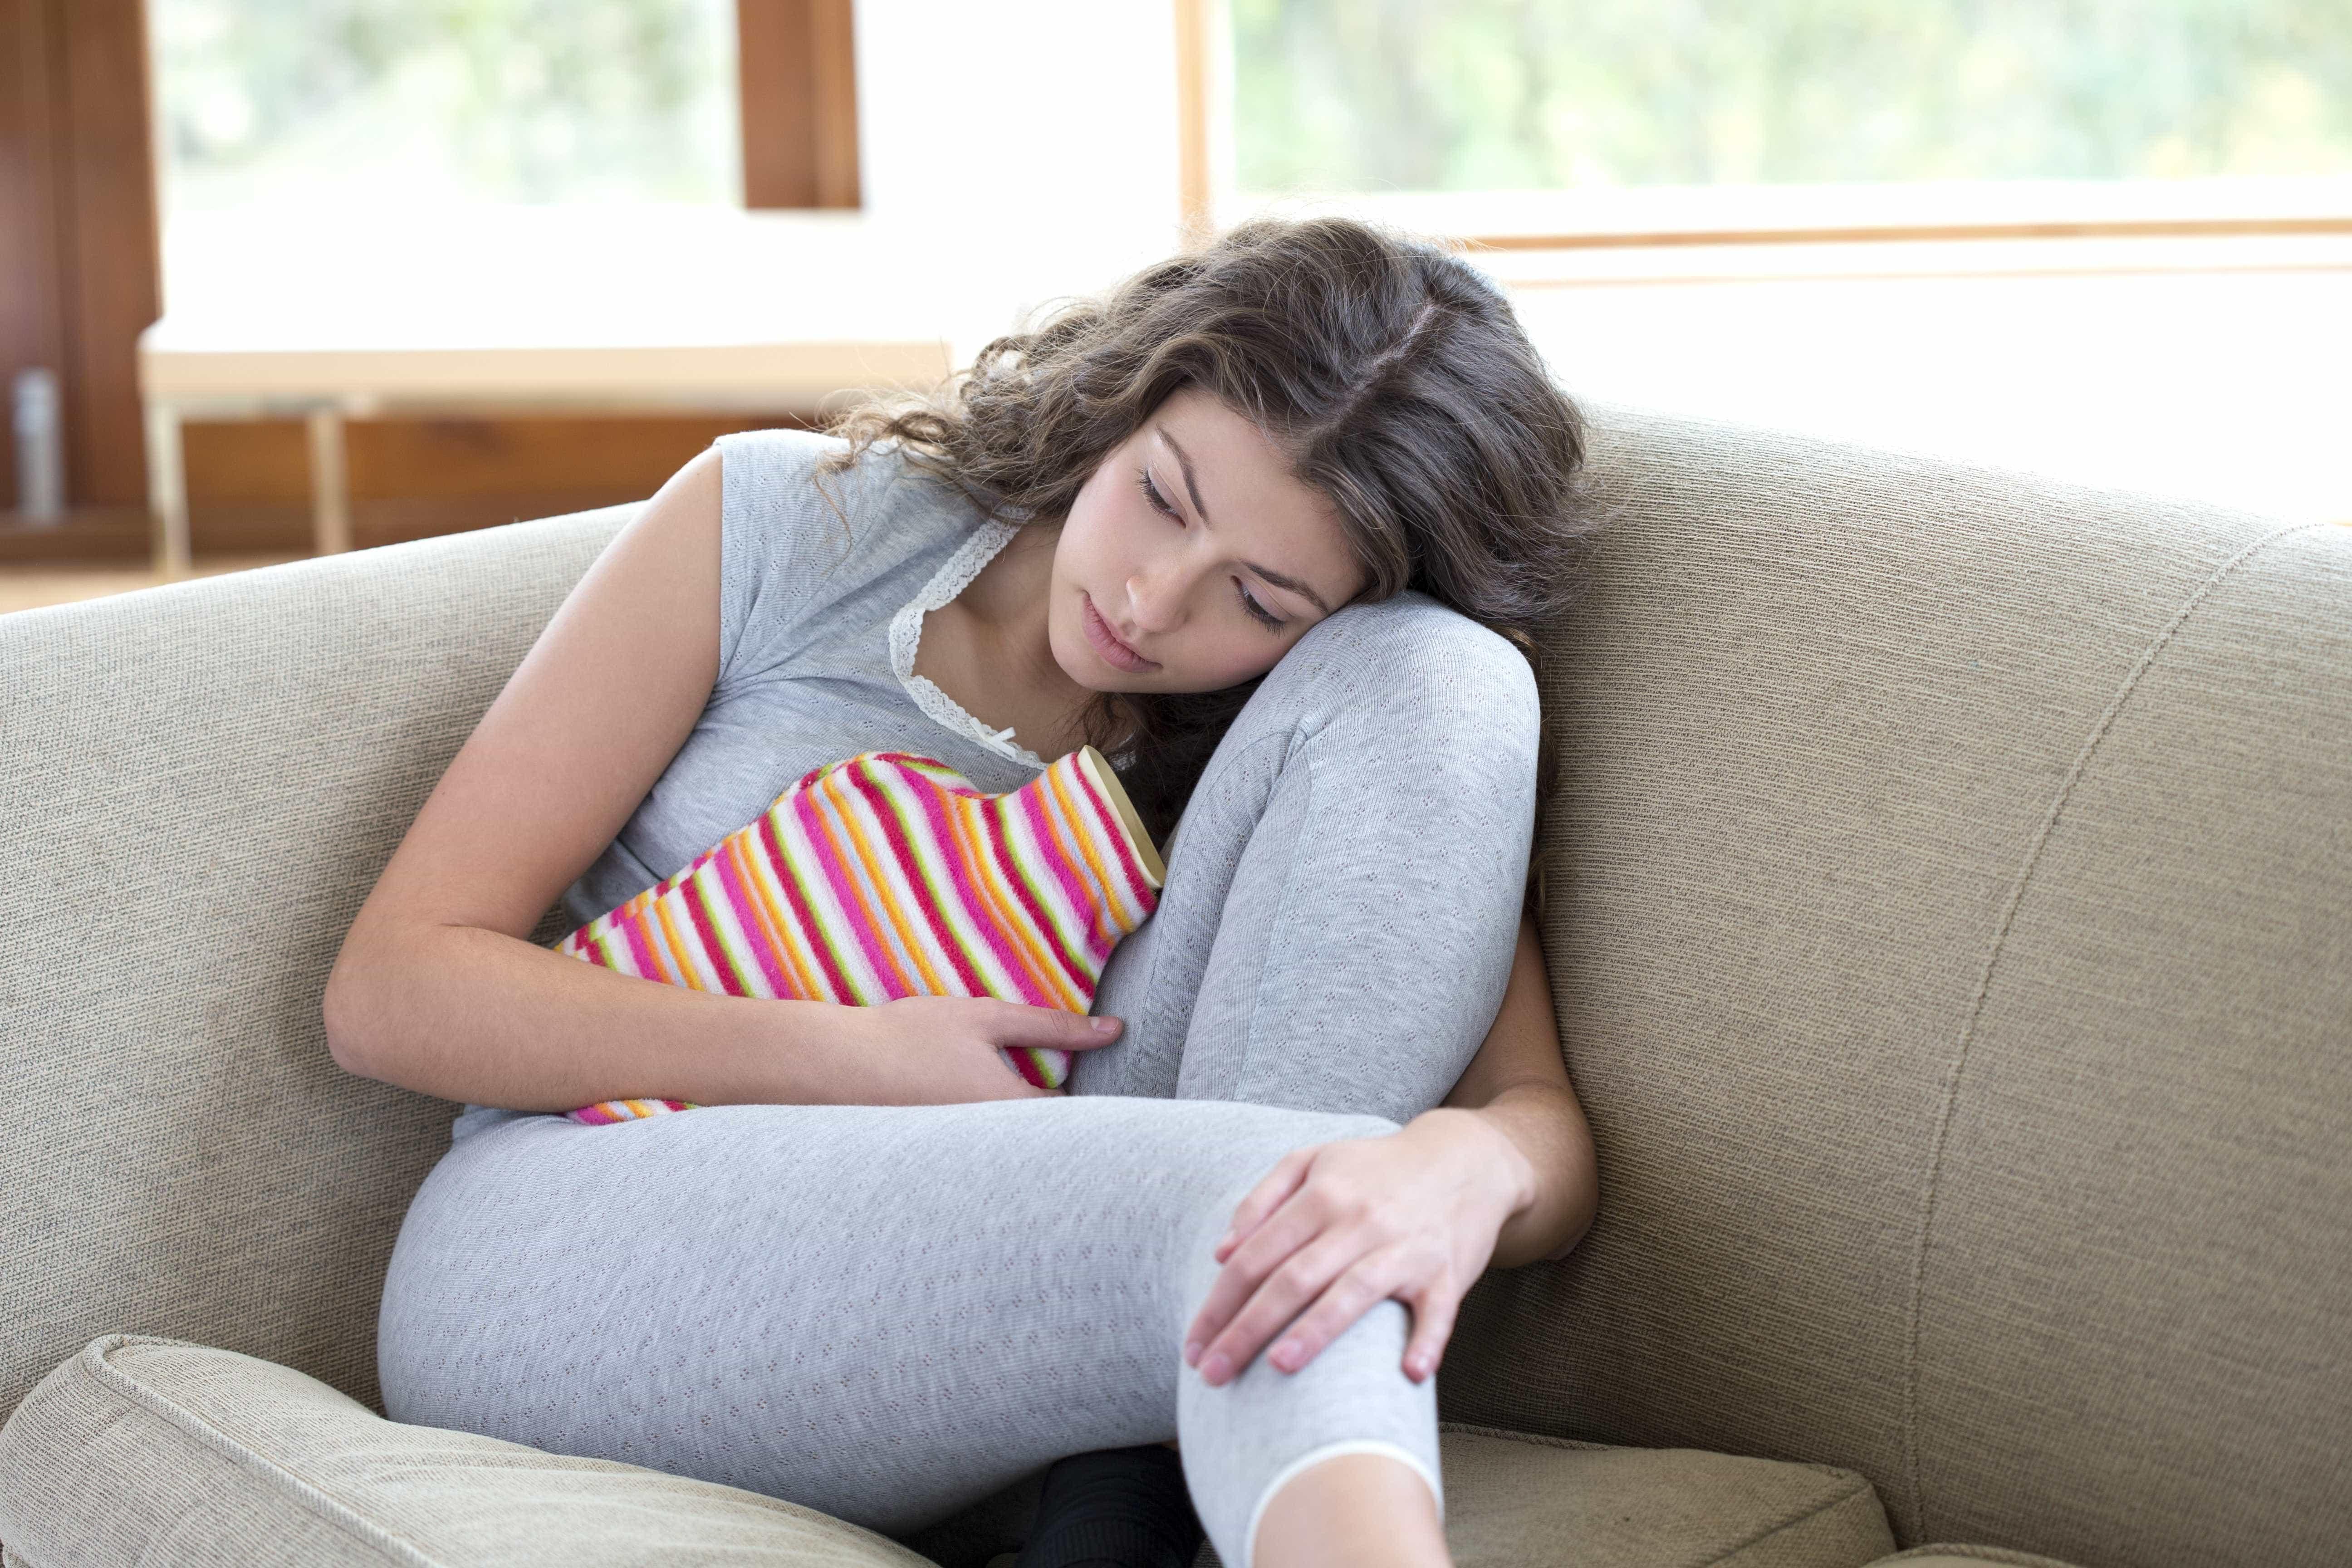 Alimentos saborosos podem ajudar a controlar sintomas da TPM; confira